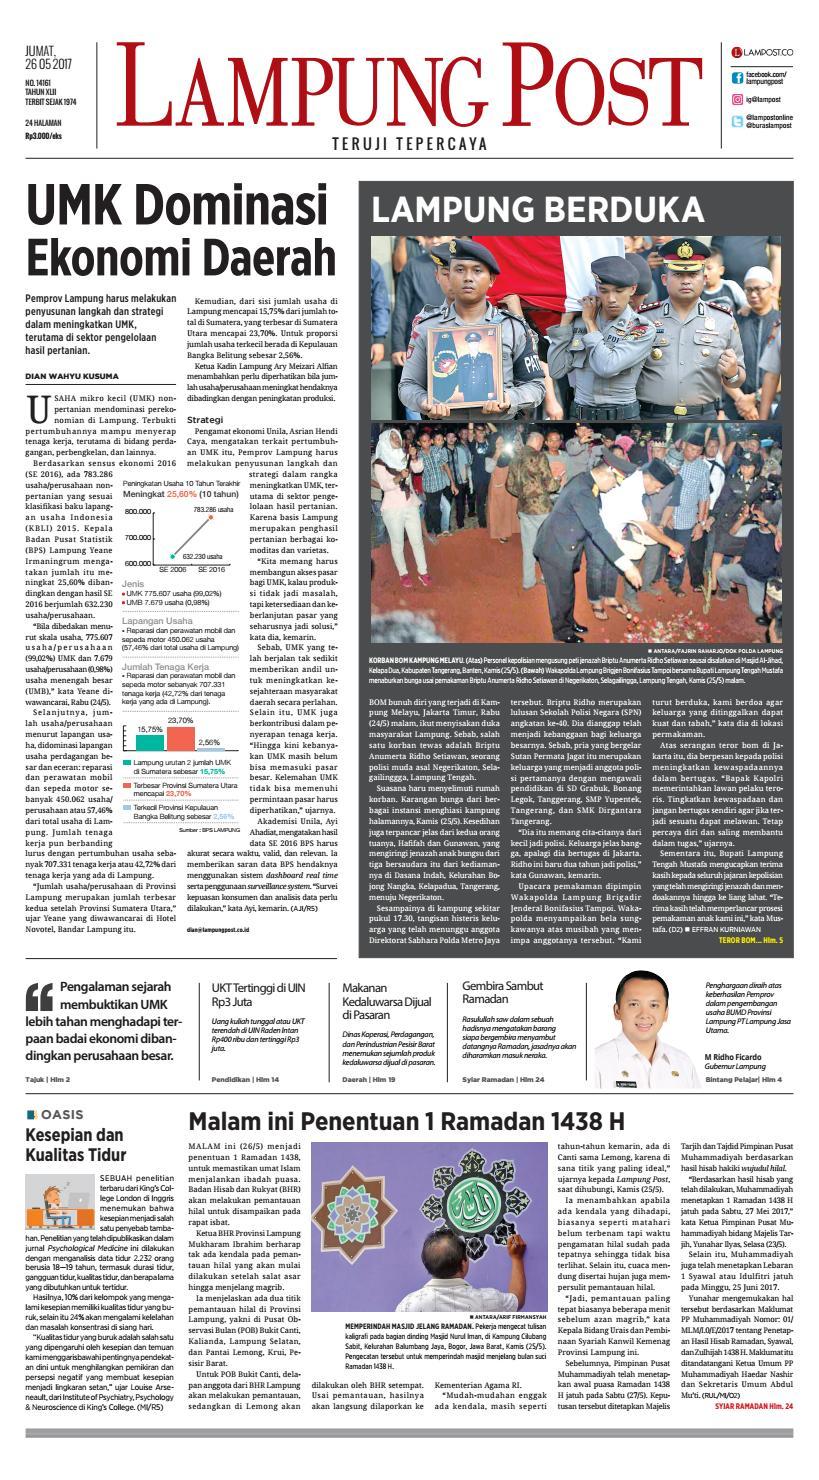 Lampung Post Jumat 26 Mei 2017 By Issuu Rejeki Anak Soleh Sony Playstation 4 Call Of Duty Infinite Warfare